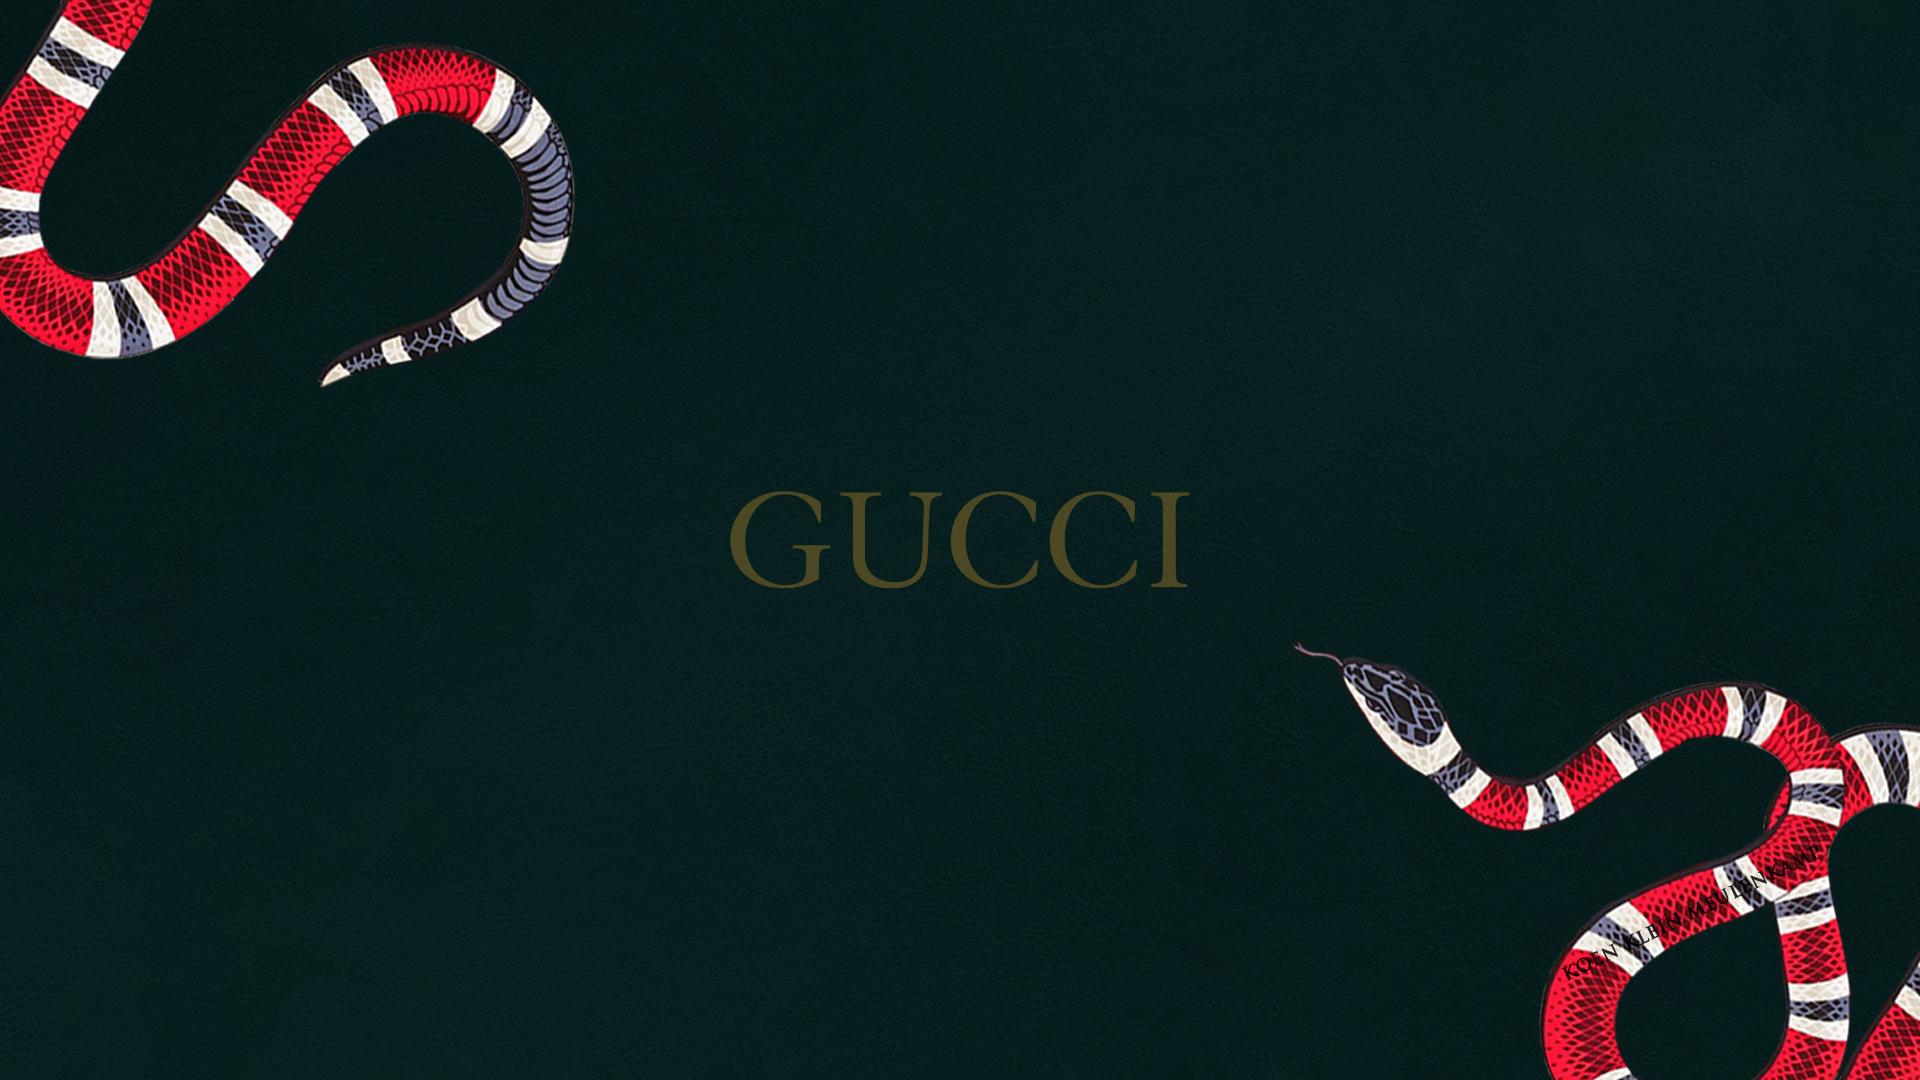 Gucci Snake Wallpaper 1920x1080